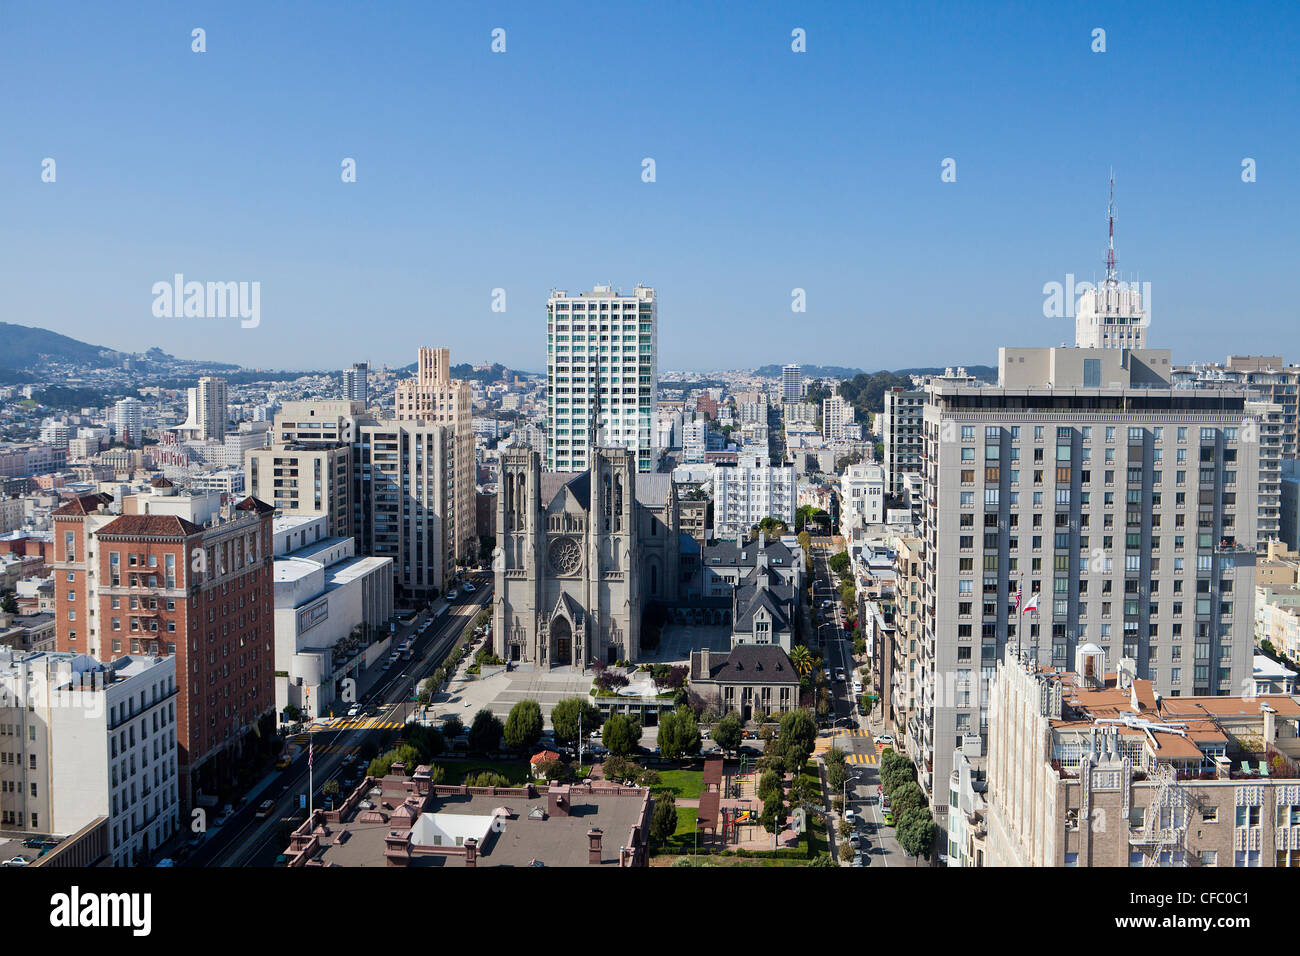 USA, USA, Amerika, Kalifornien, San Francisco, Stadt, Grace Cathedral, Kirche, Stadt, Skyline, quadratisch Stockbild